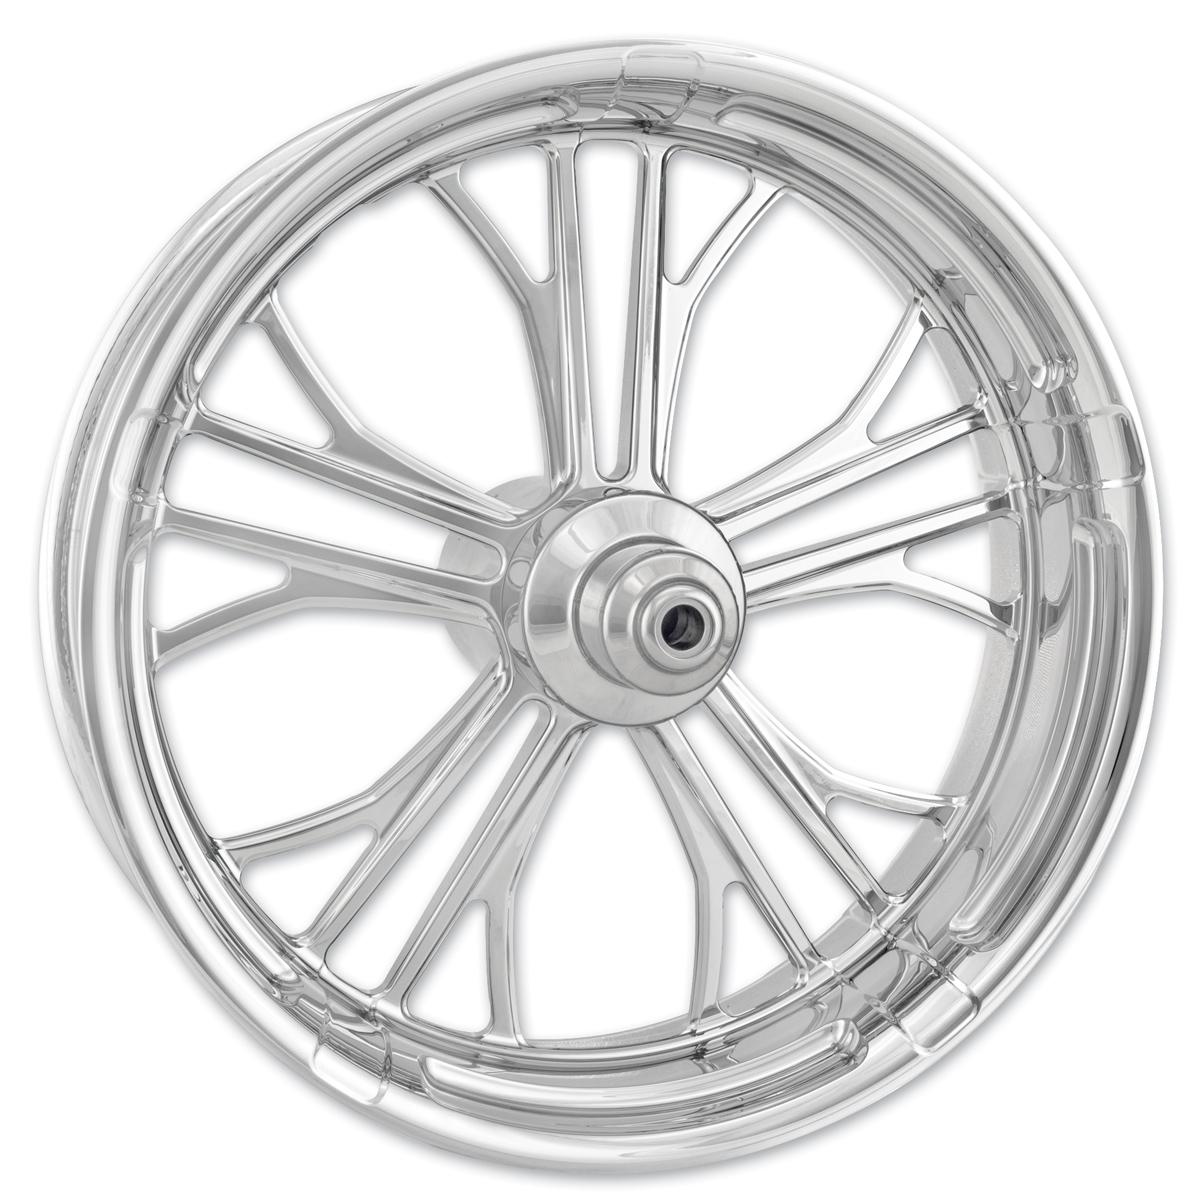 Performance Machine Dixon Chrome Rear Wheel 18x5.5 ABS